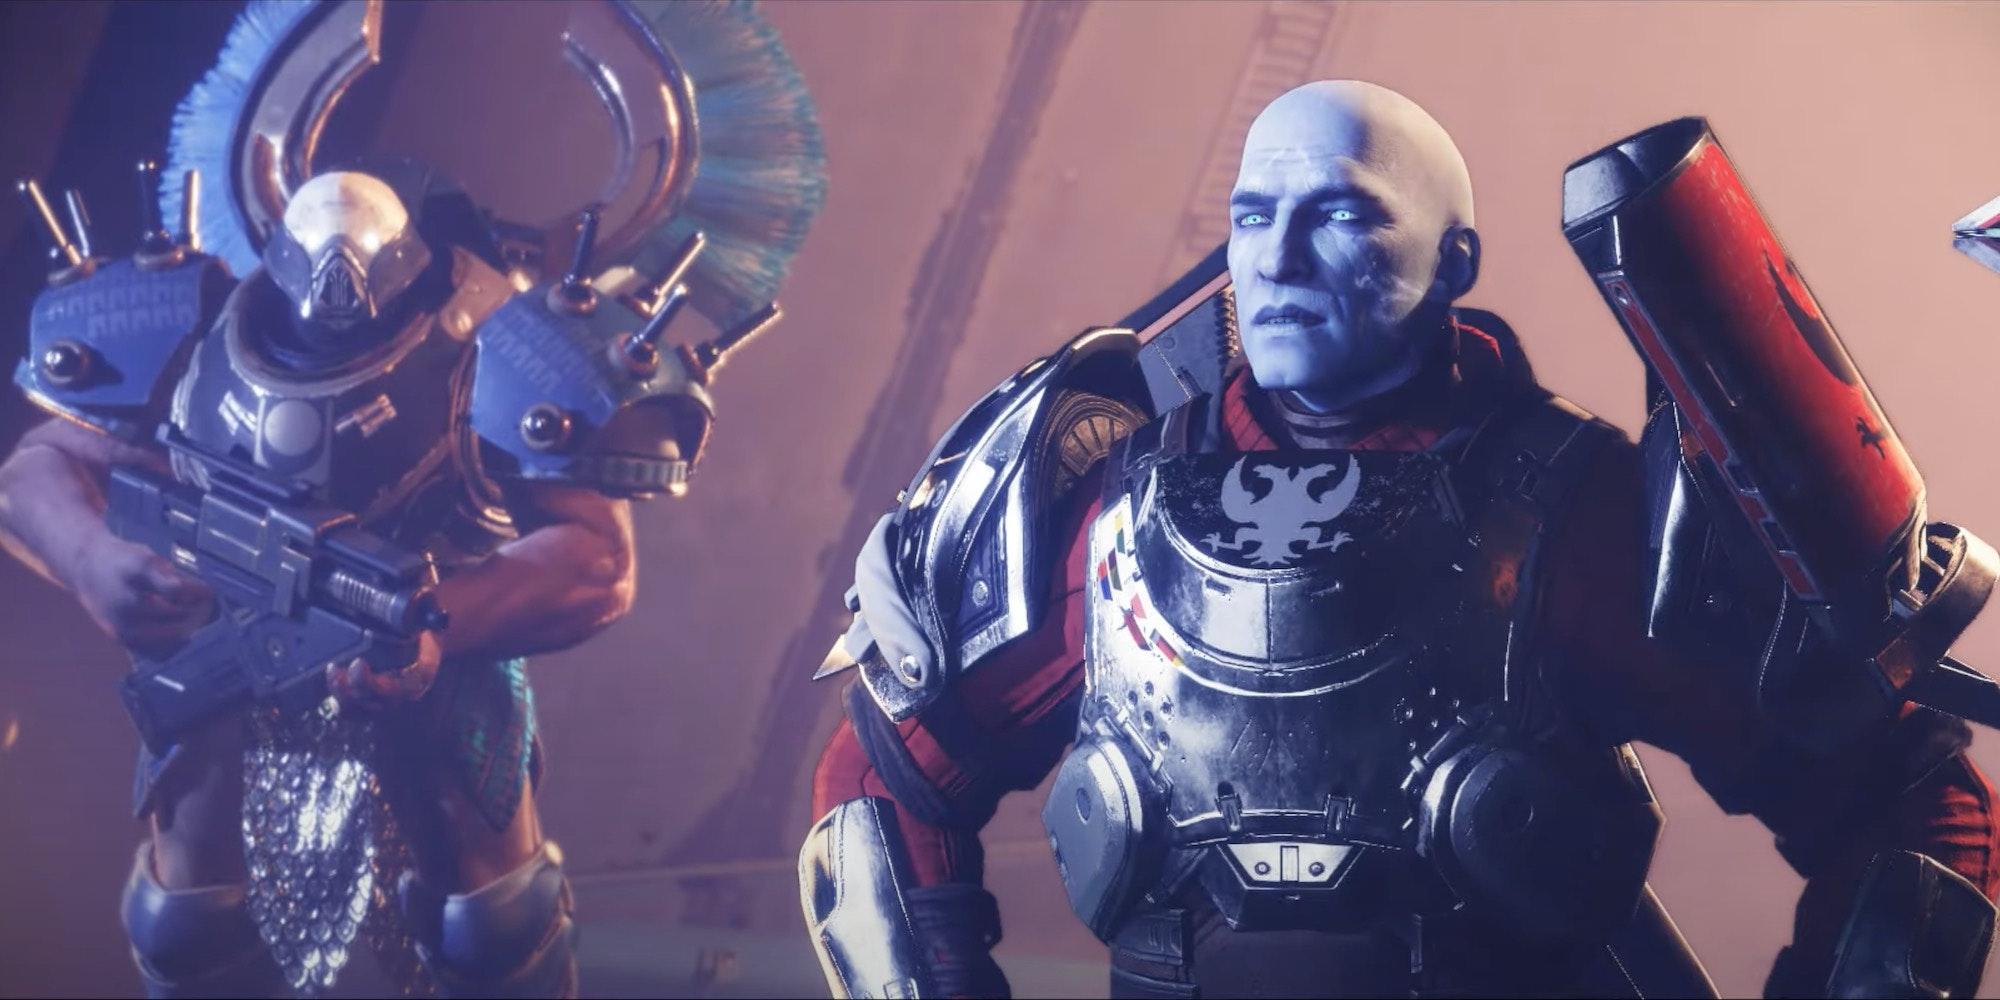 commander zavala (right) in destiny 2's season of the chosen